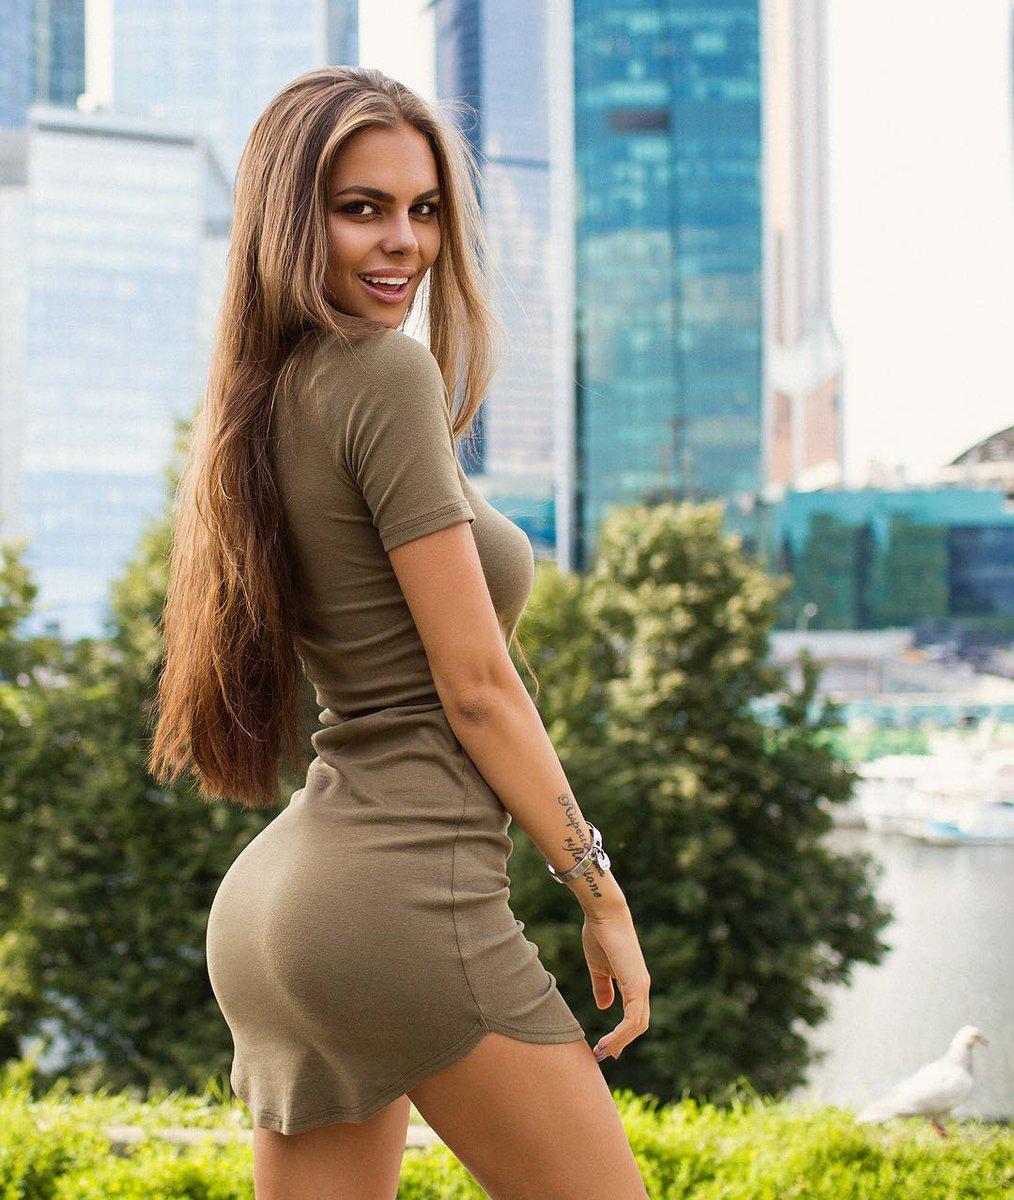 Fappening Twitter Viktoria Odintcova naked photo 2017